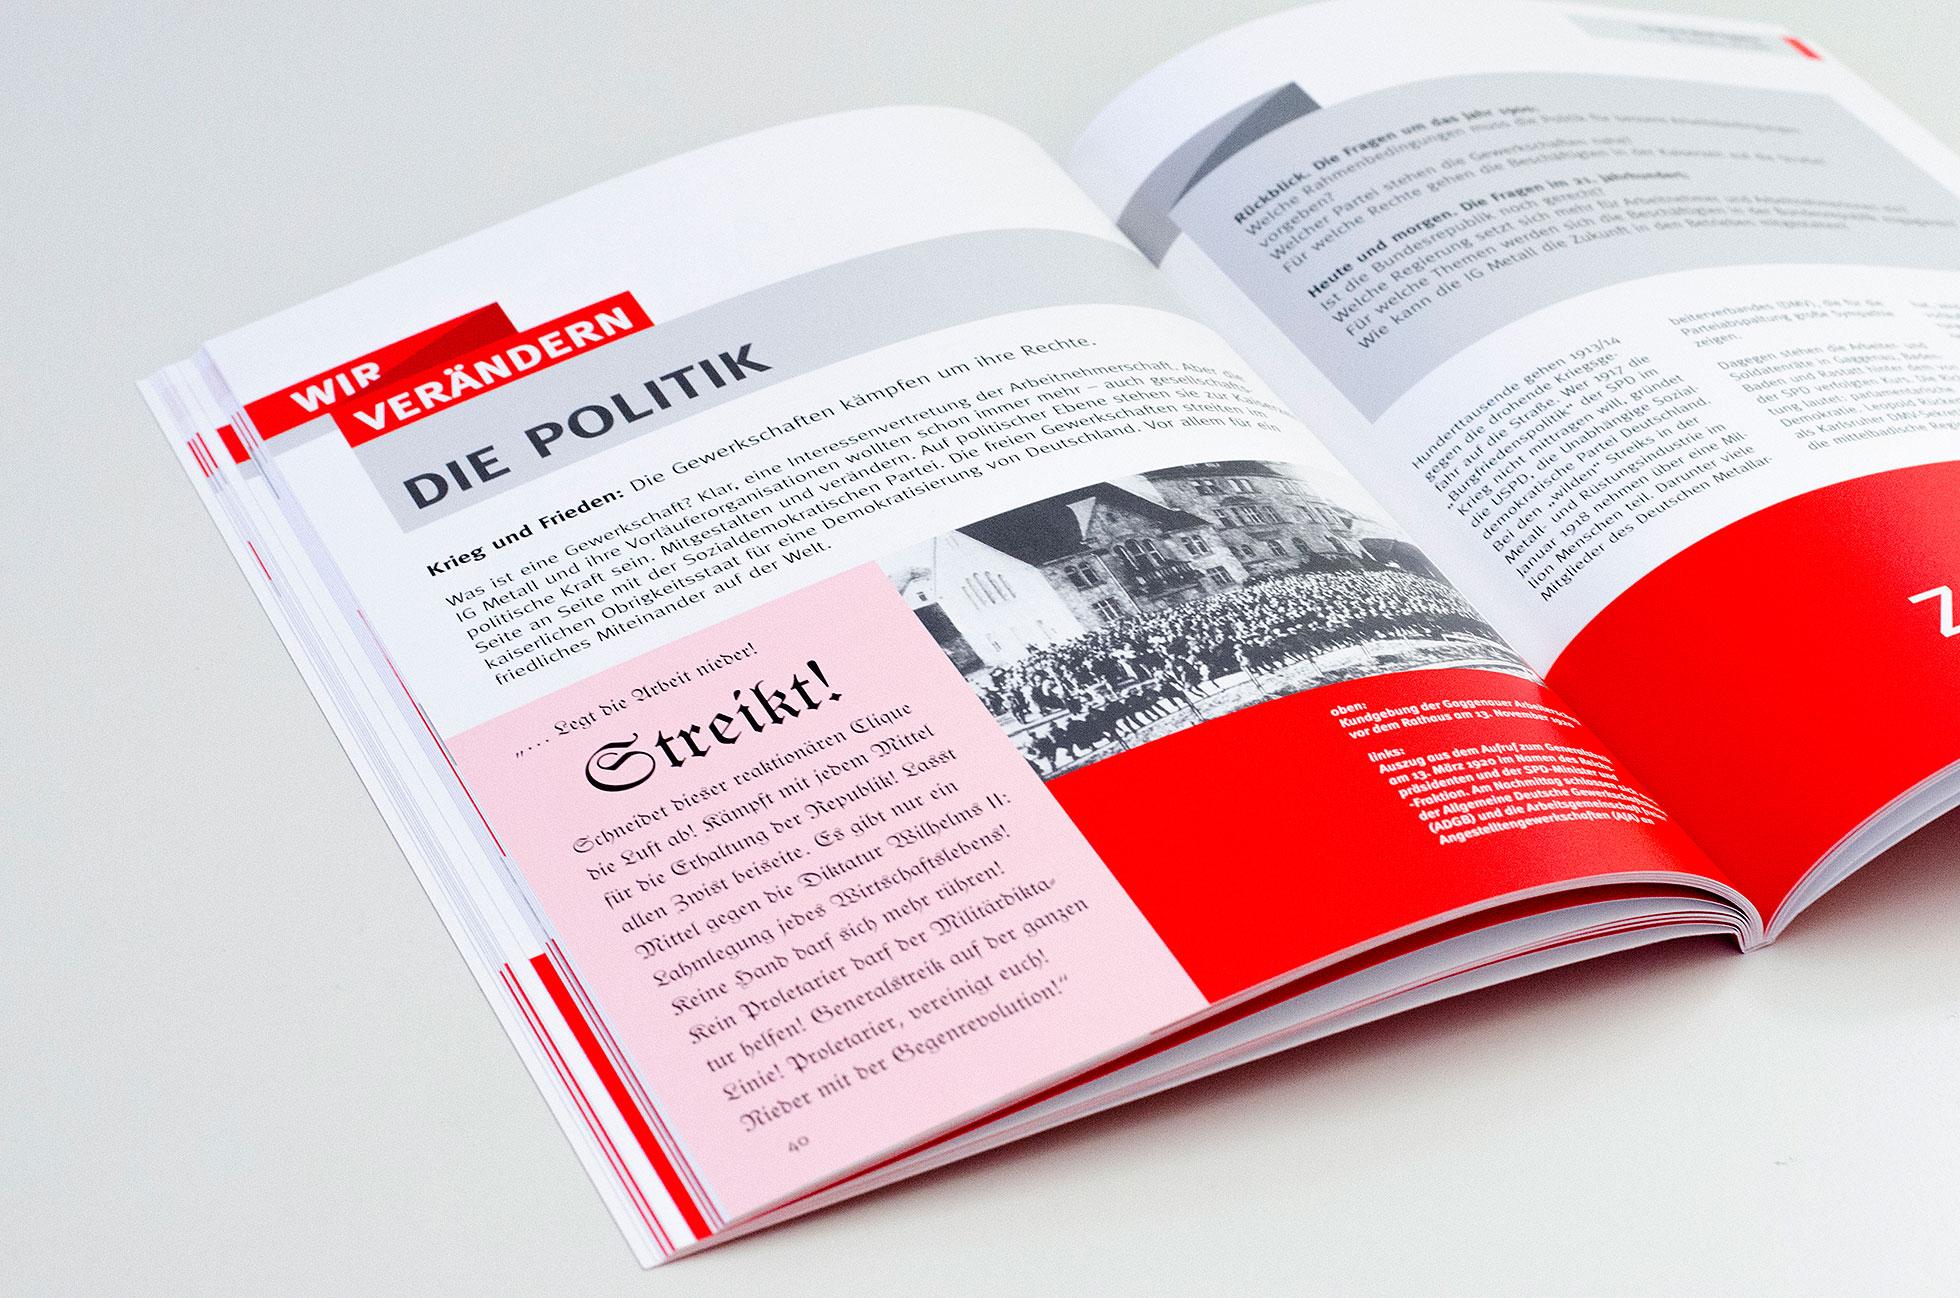 125 Jahre IG Metall Gaggenau – WIR  VERÄNDERN